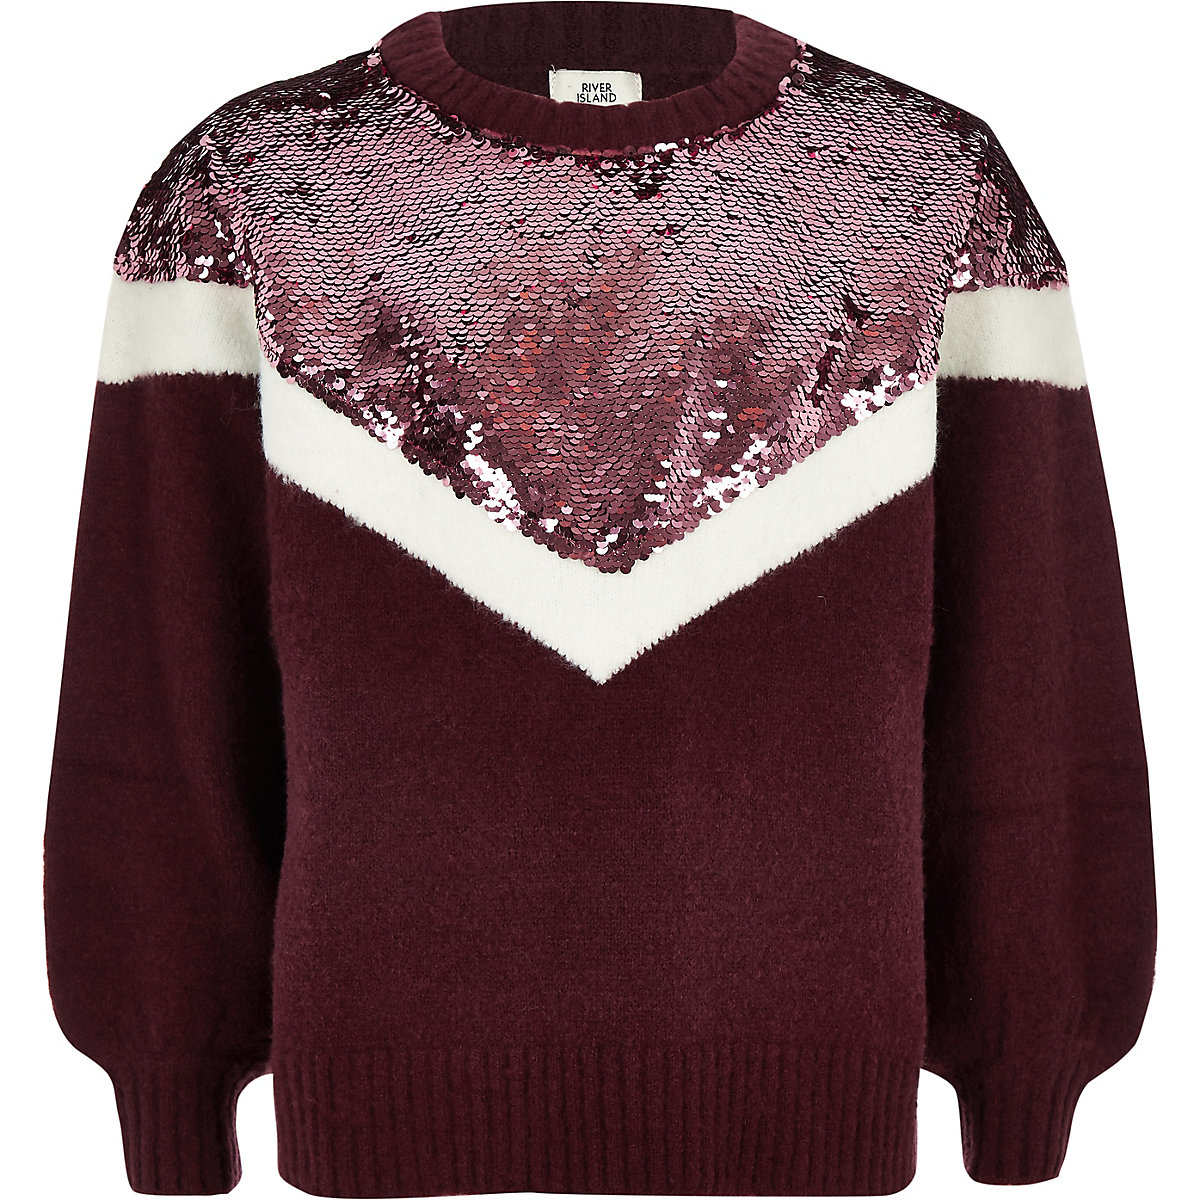 Girls purple chevron sequin knit jumper